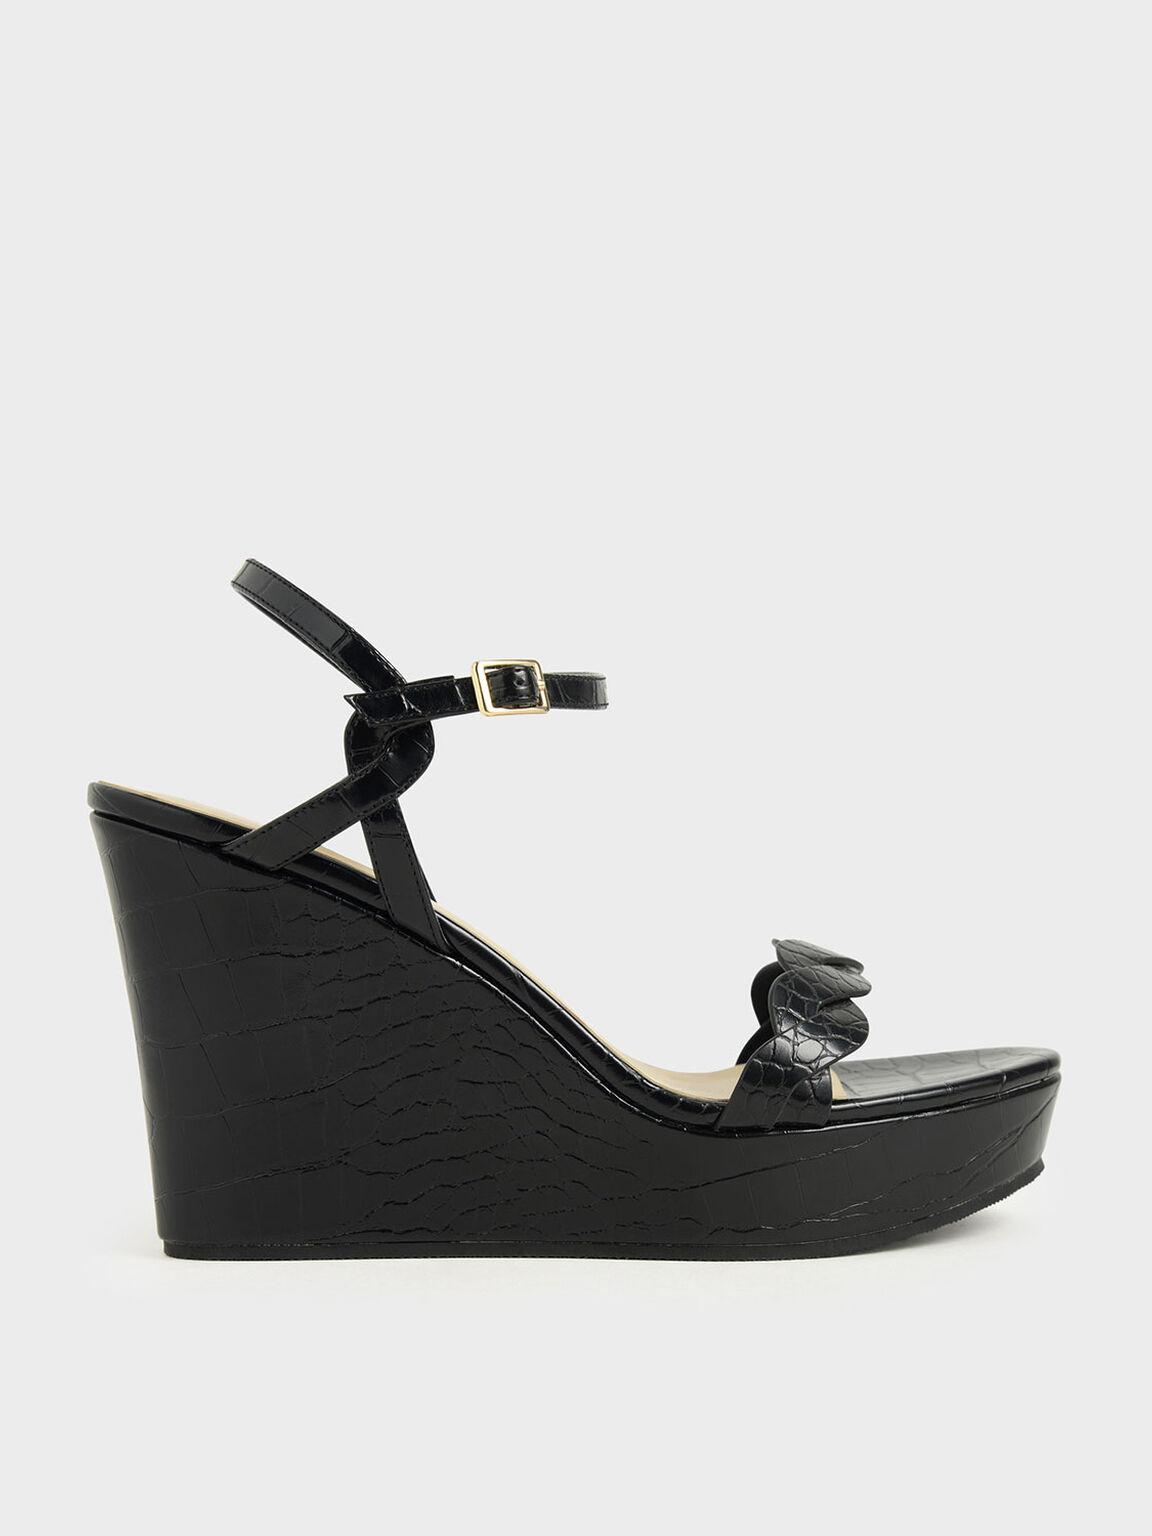 Croc-Effect Twist Strap Platform Wedges, Black, hi-res